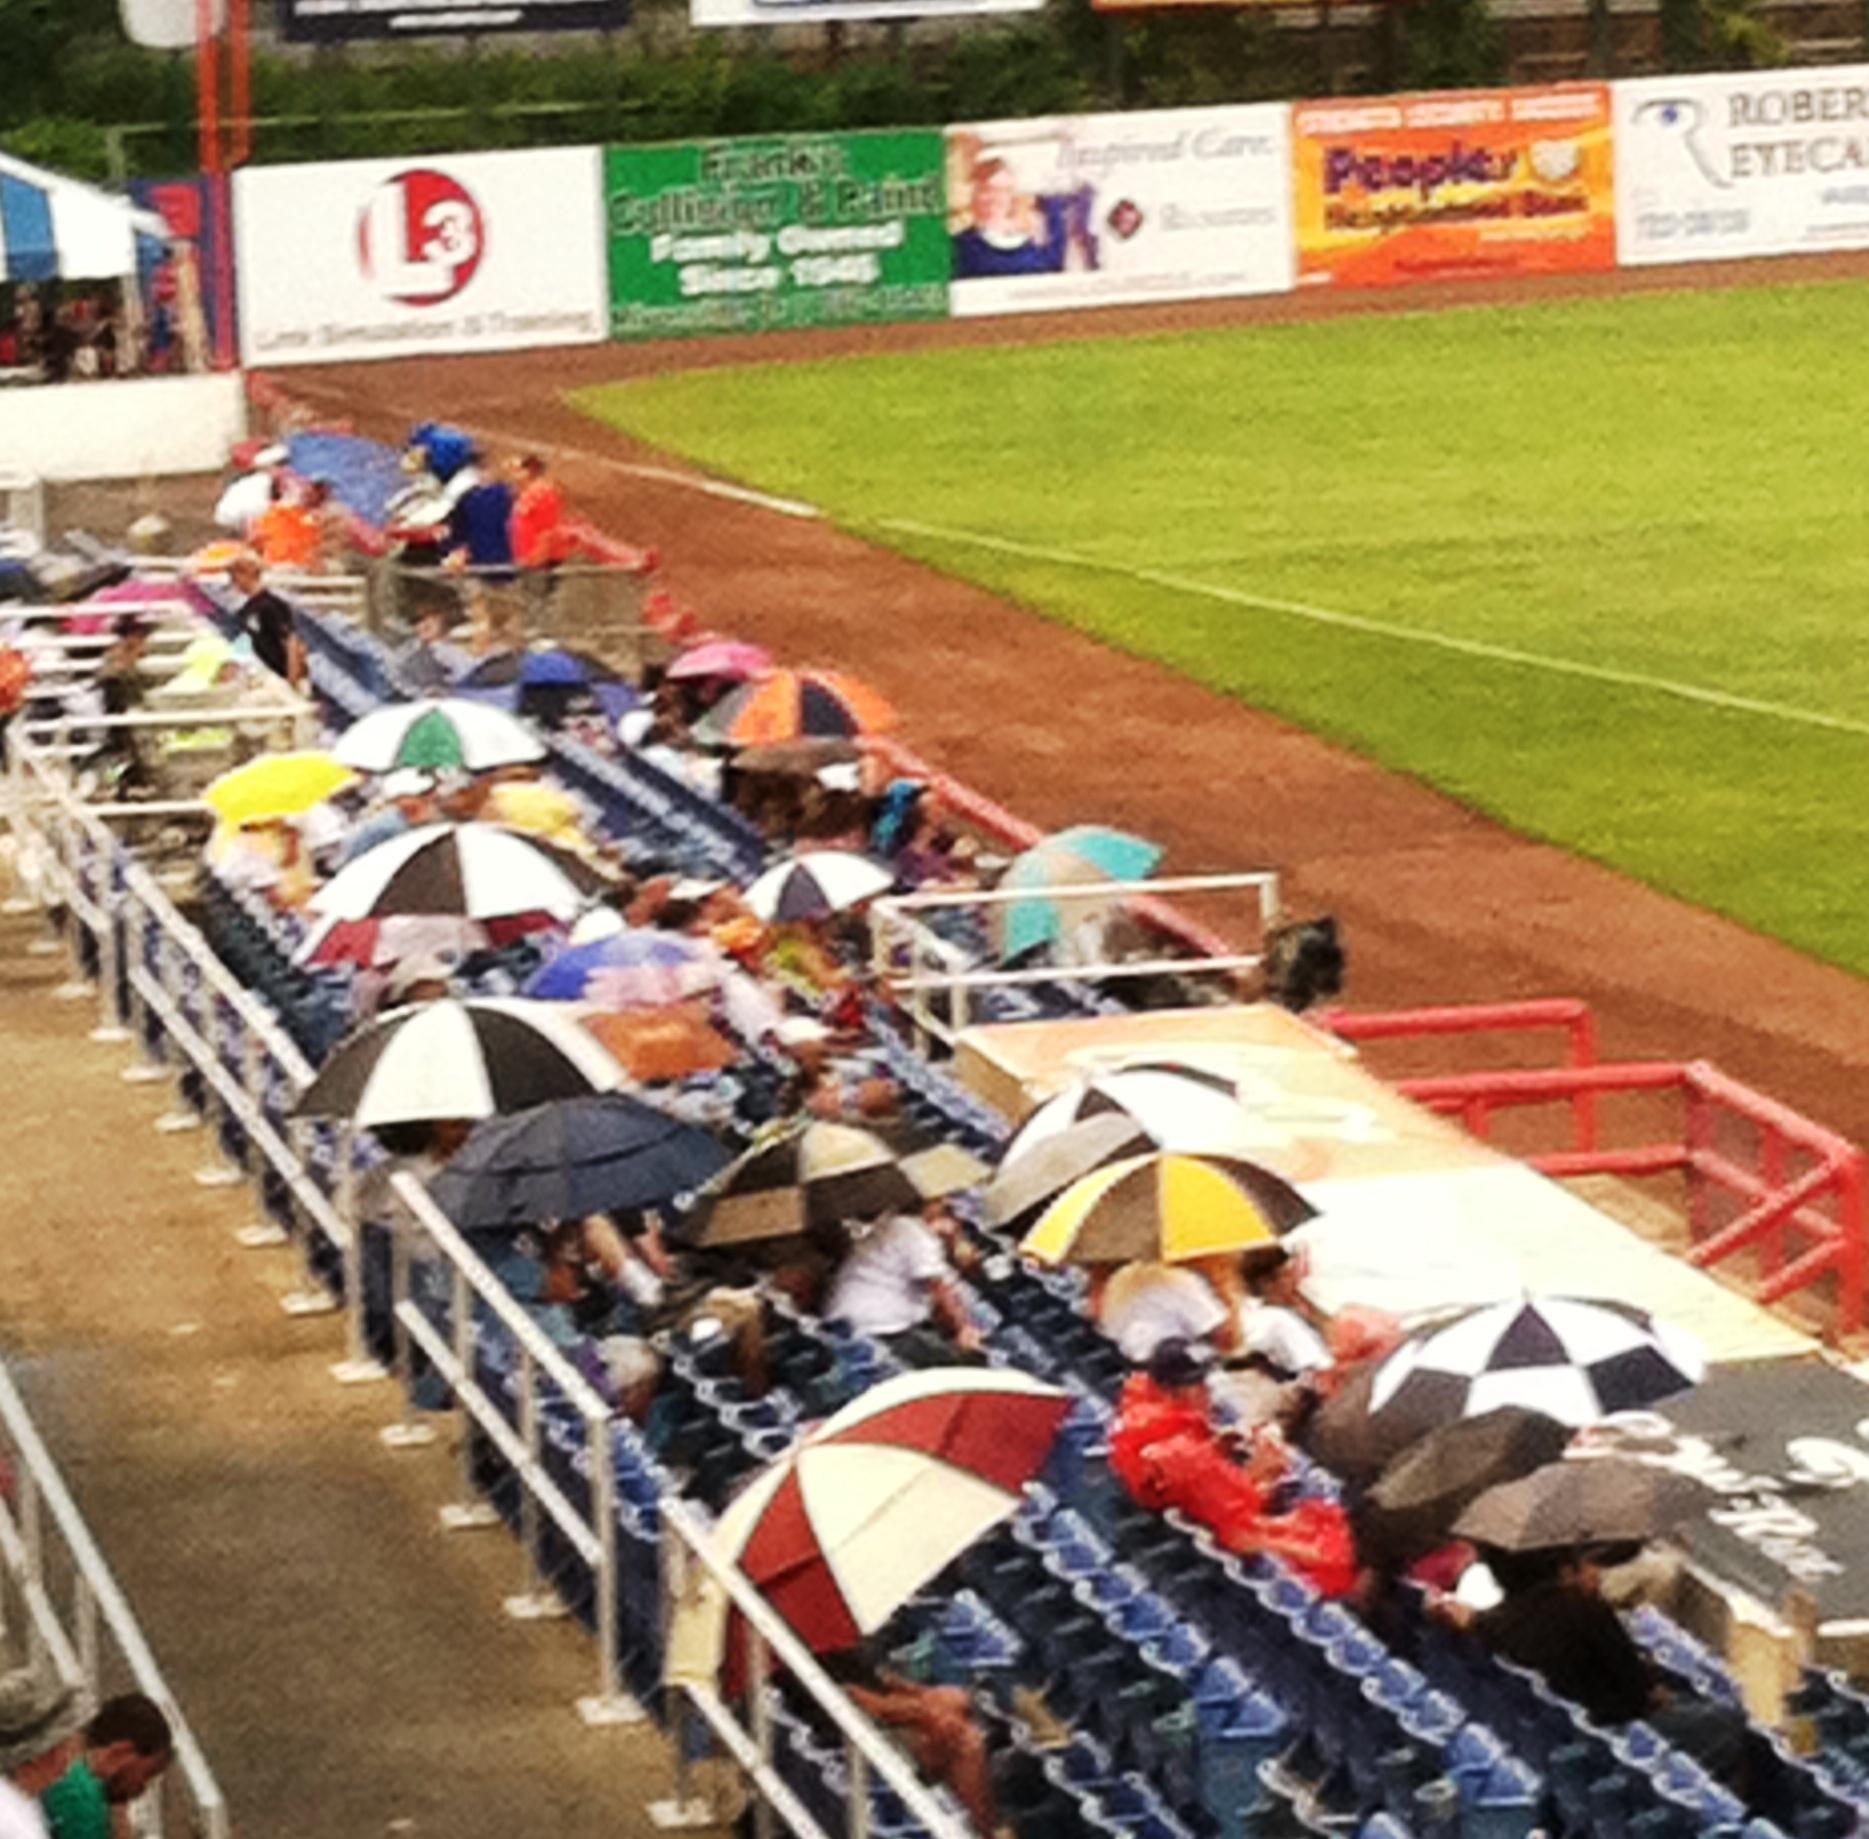 NYSEG Umbrellas Resize